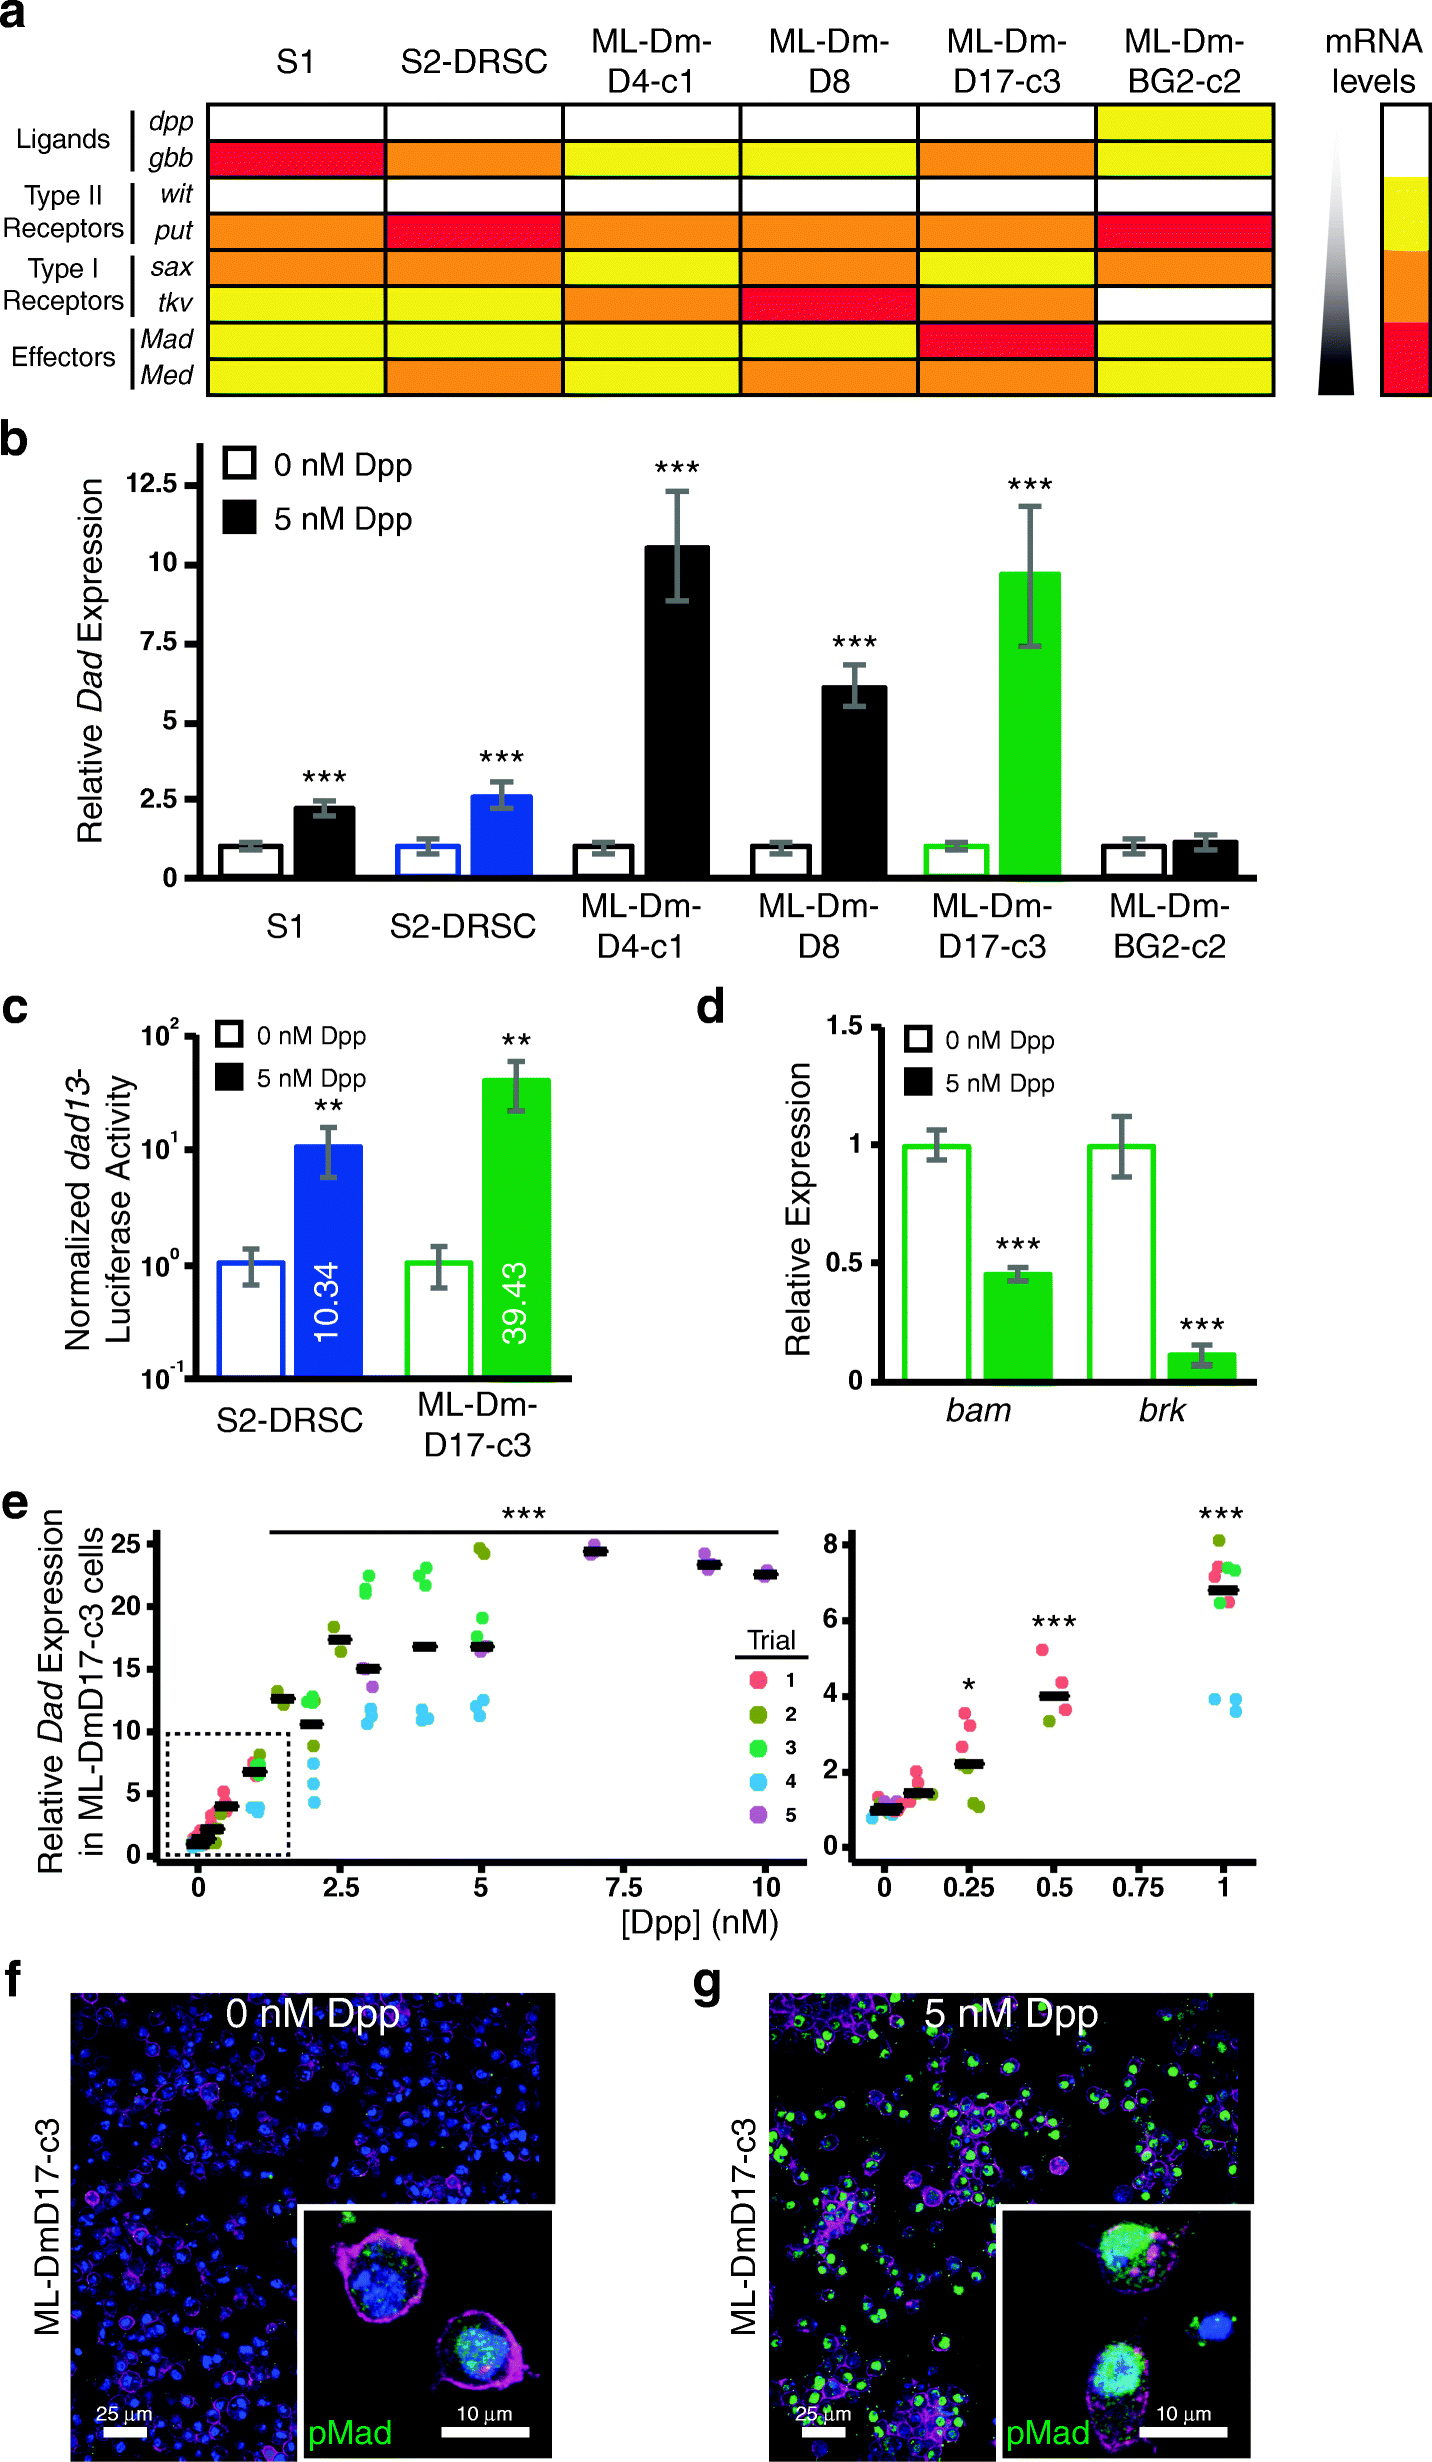 Drosophila ML-DmD17-c3 cells respond robustly to Dpp and exhibit